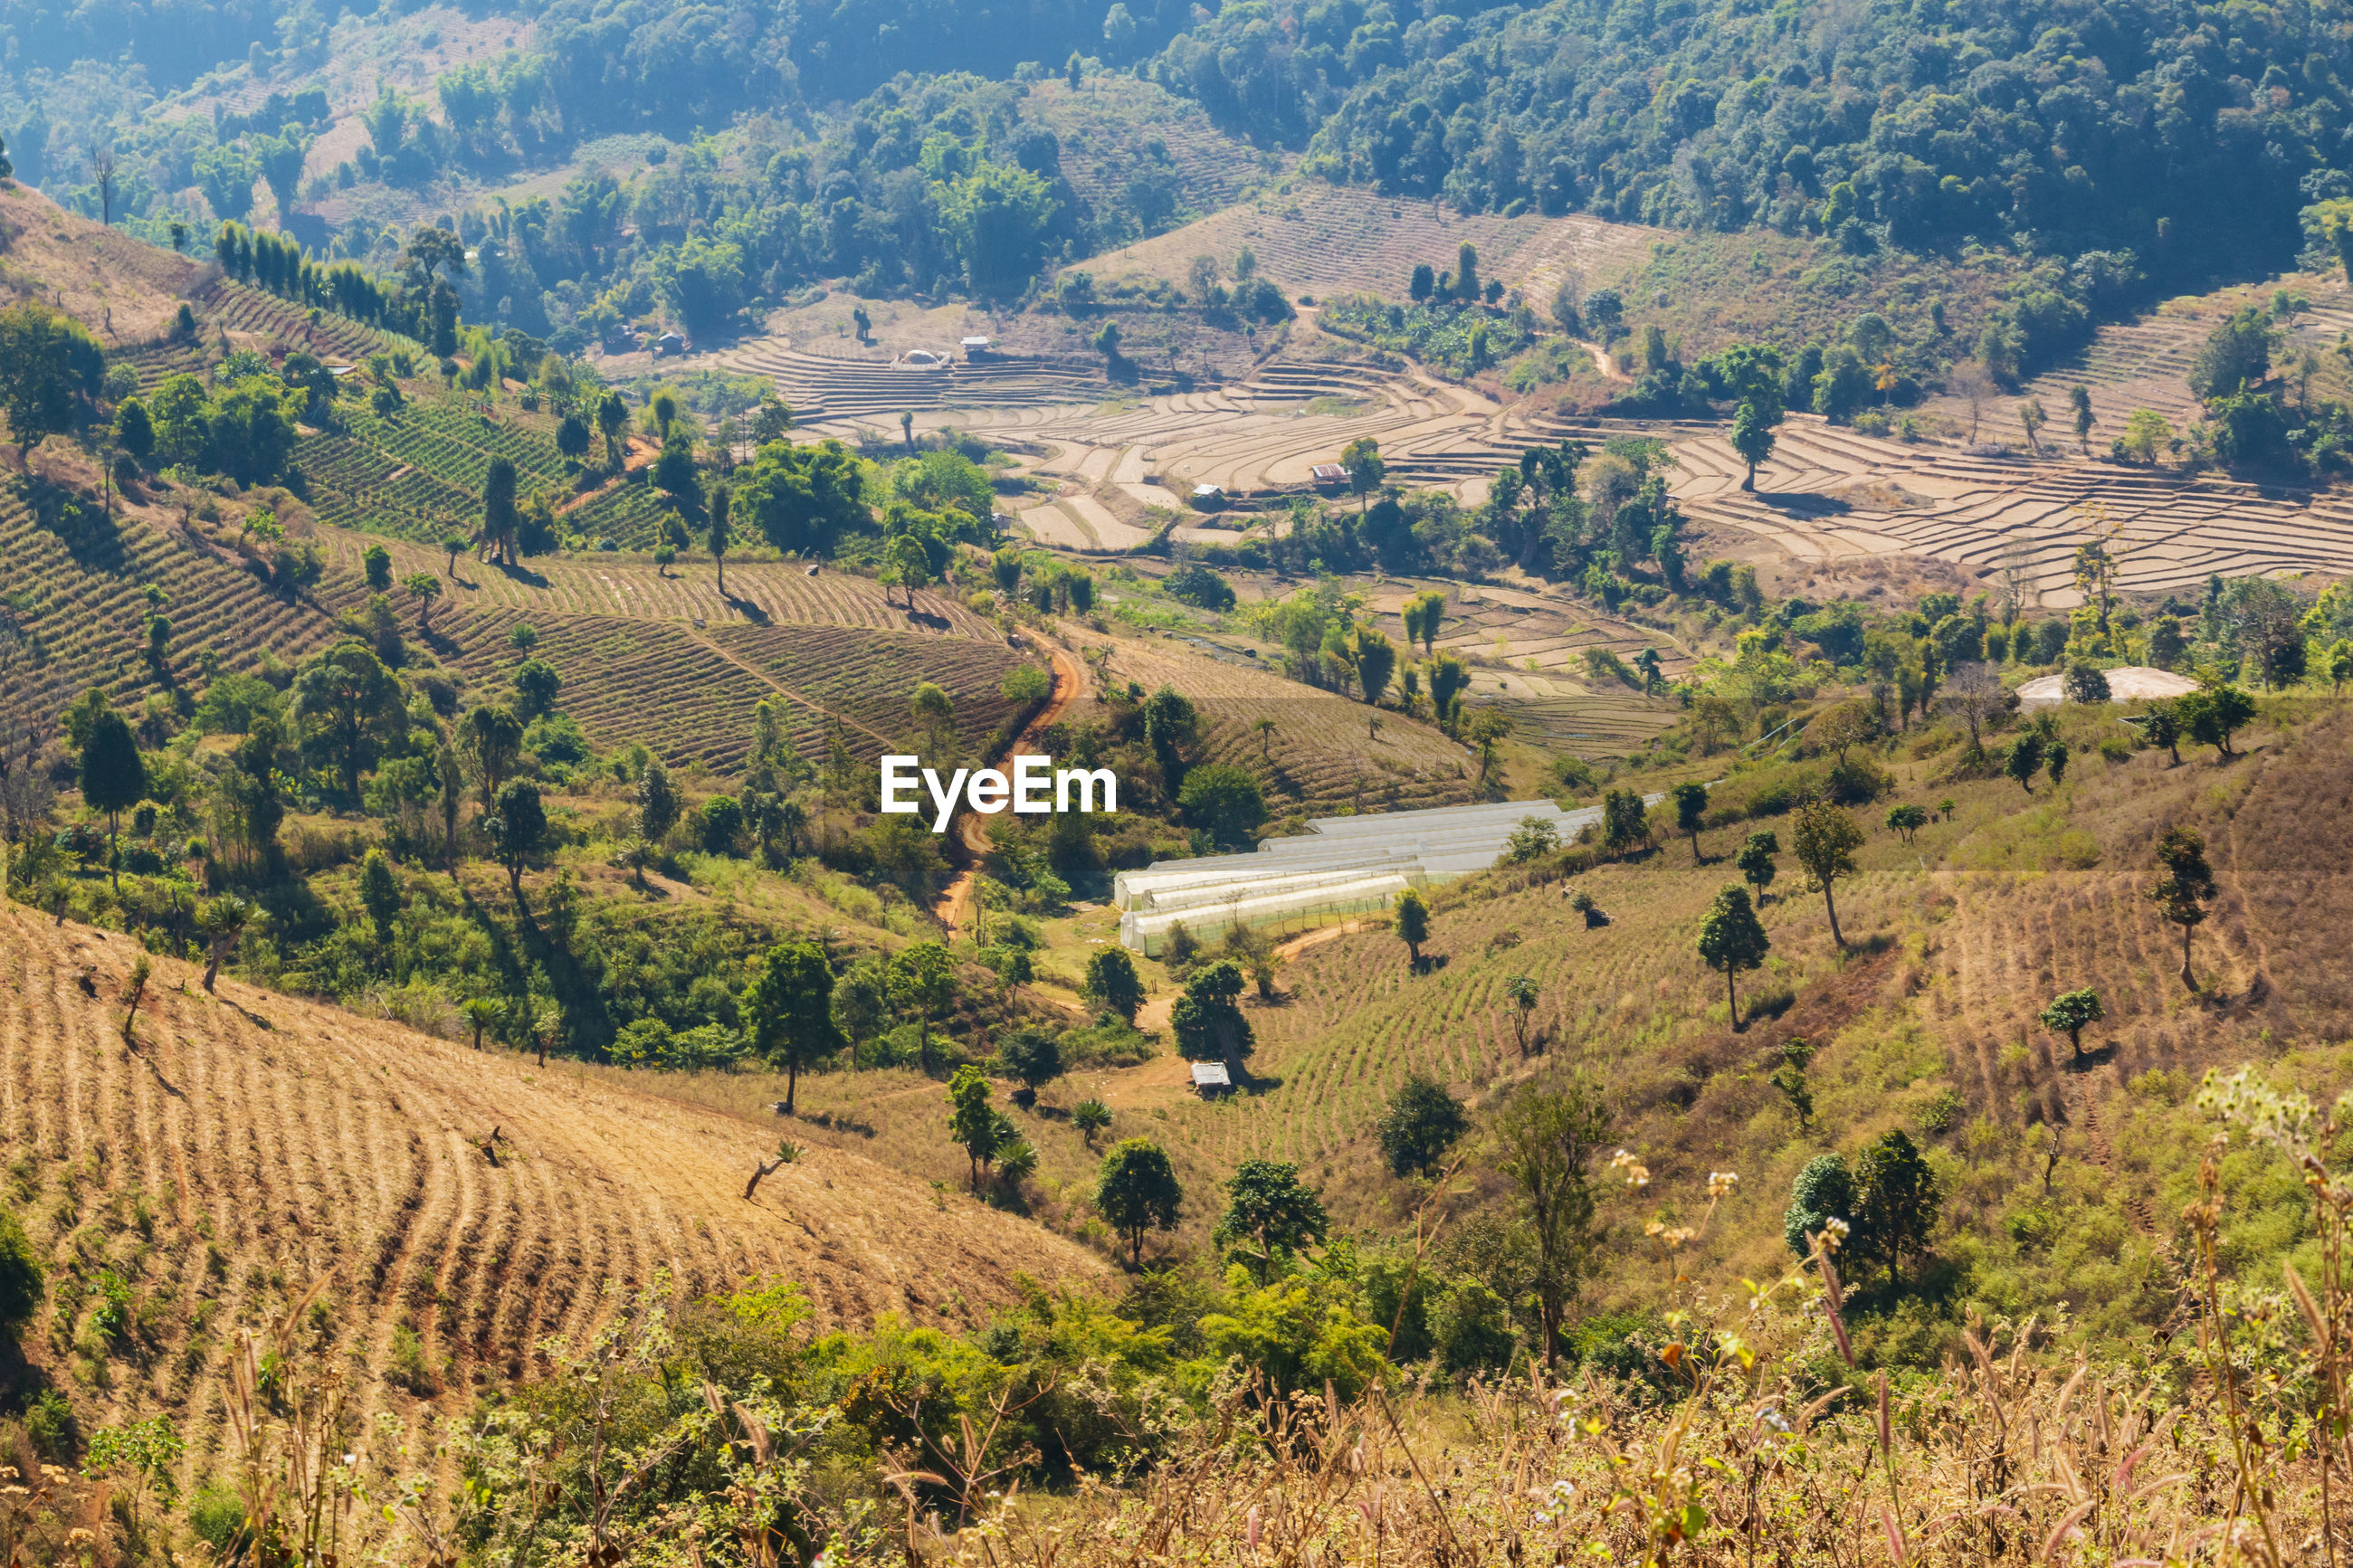 Farmland in the valley mae tho national park, chiang mai, thailand